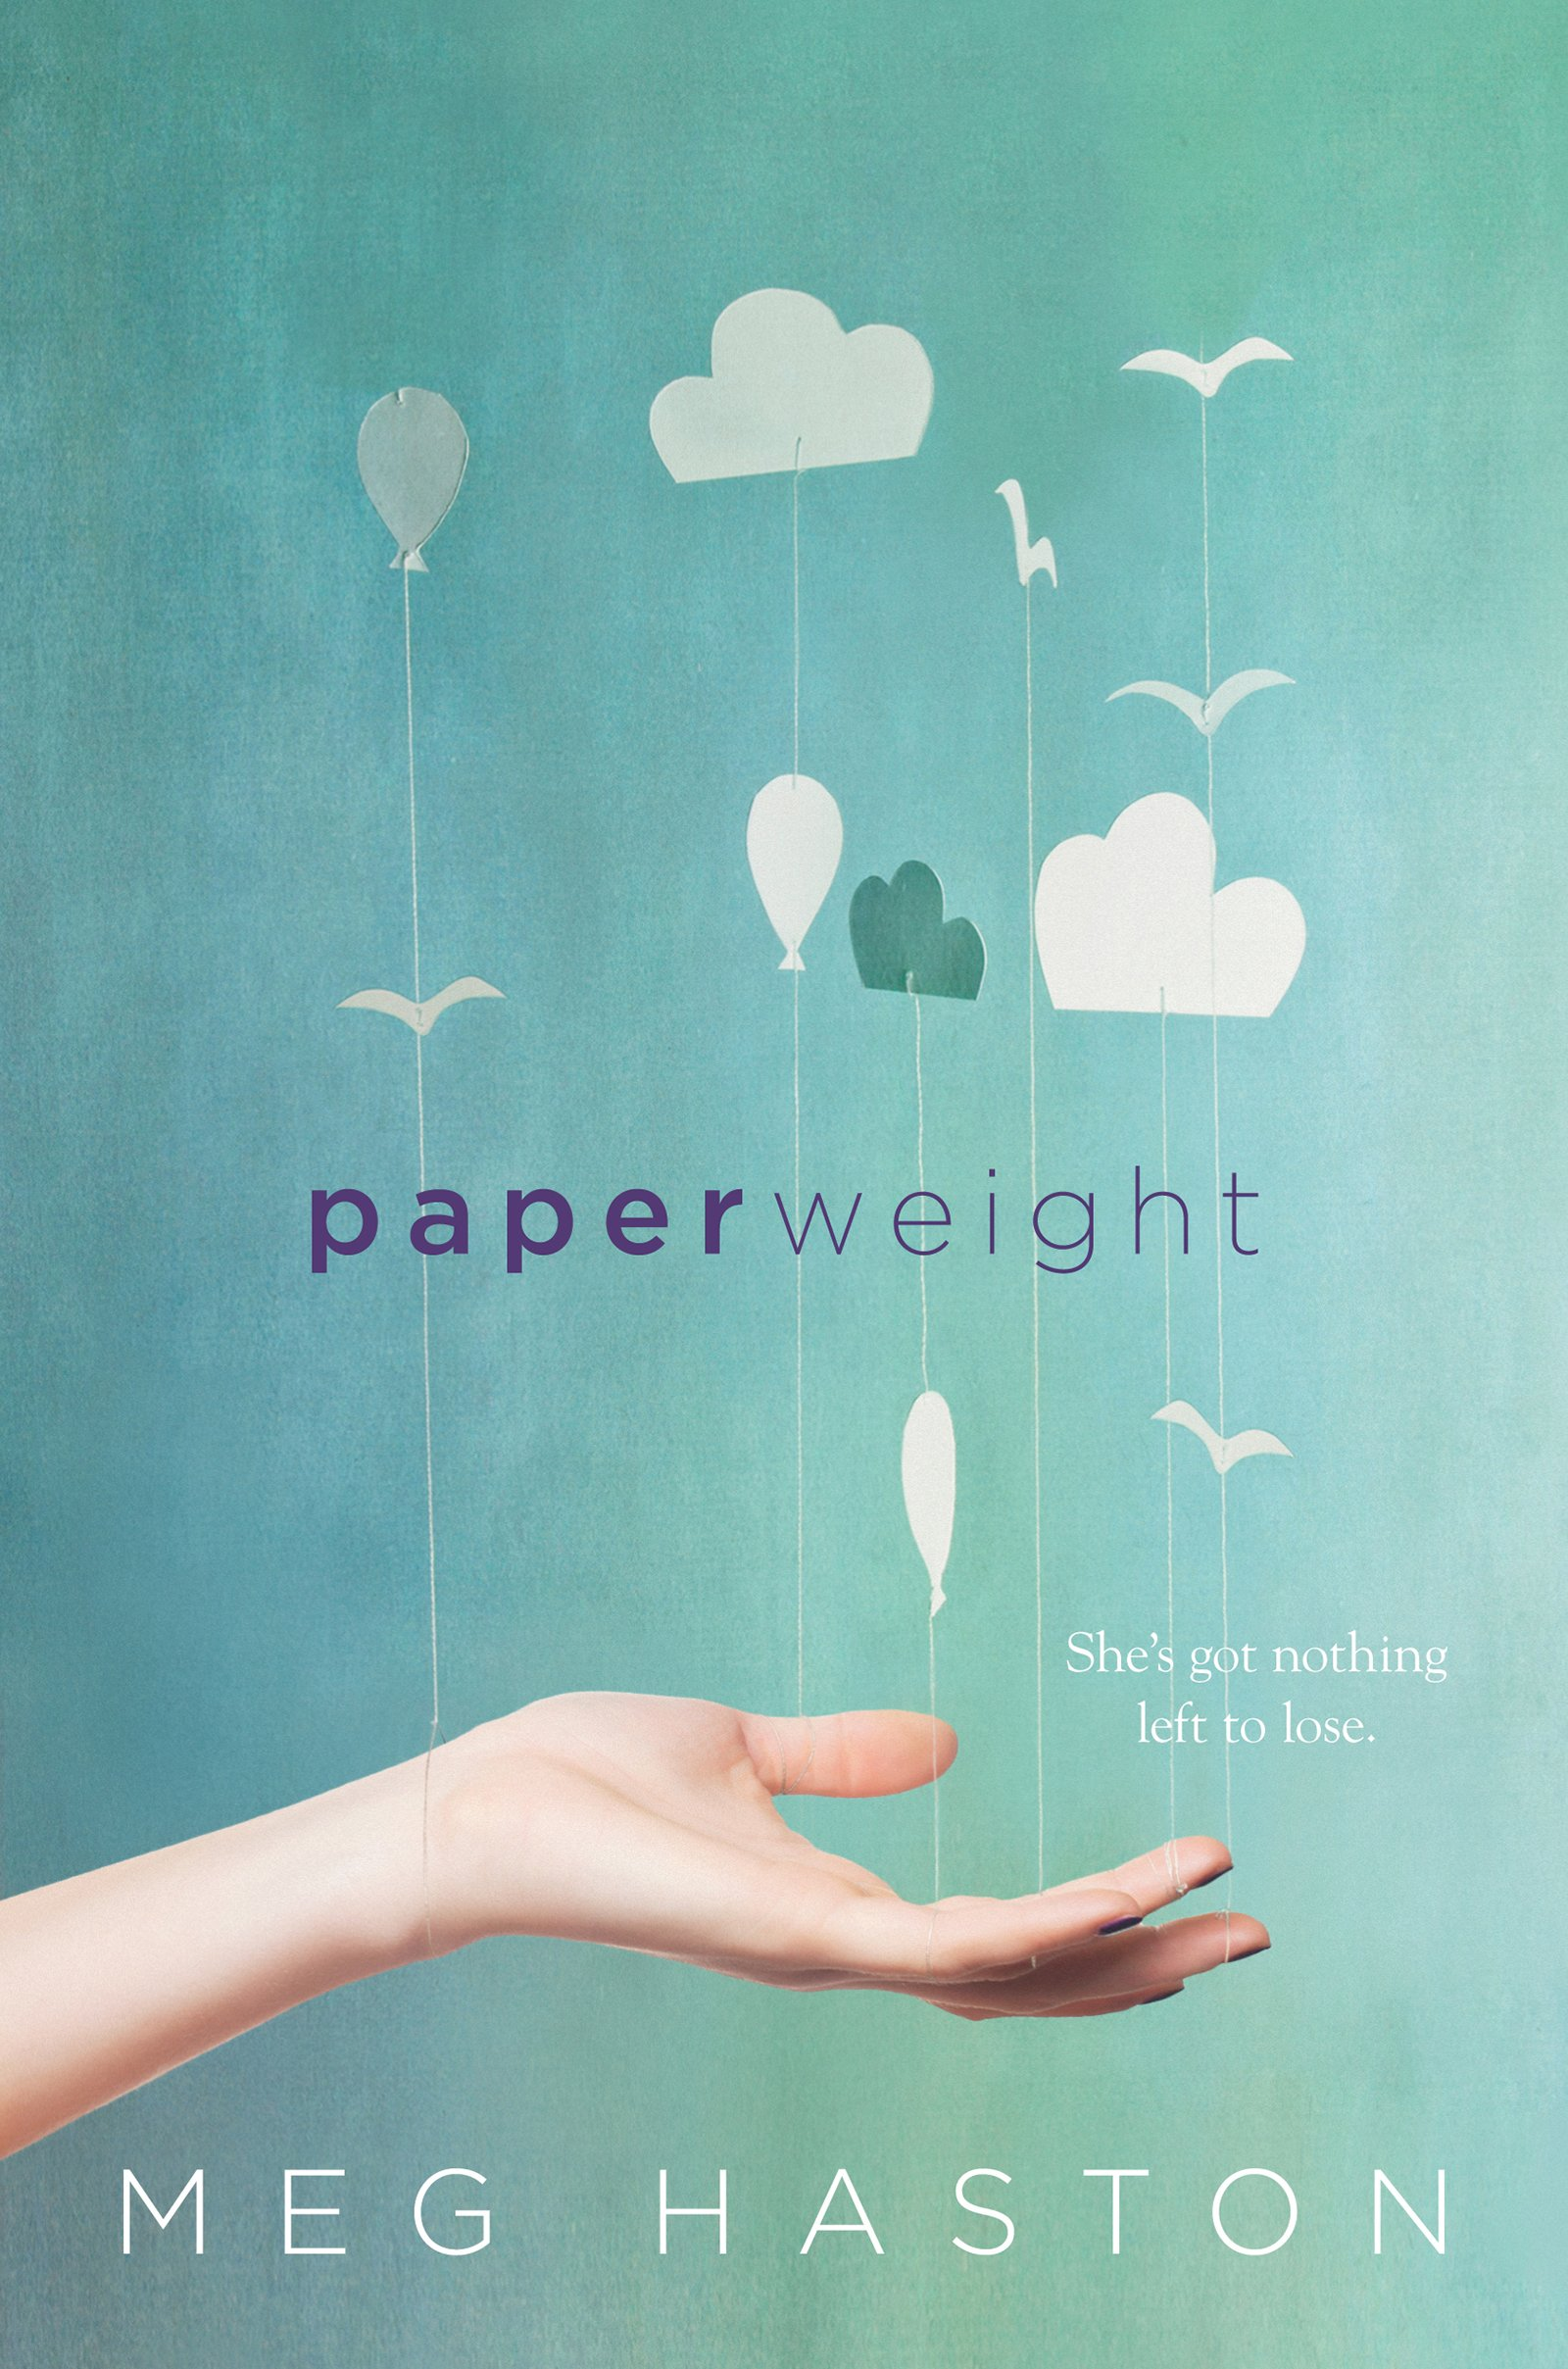 paperweight_meghaston.jpg